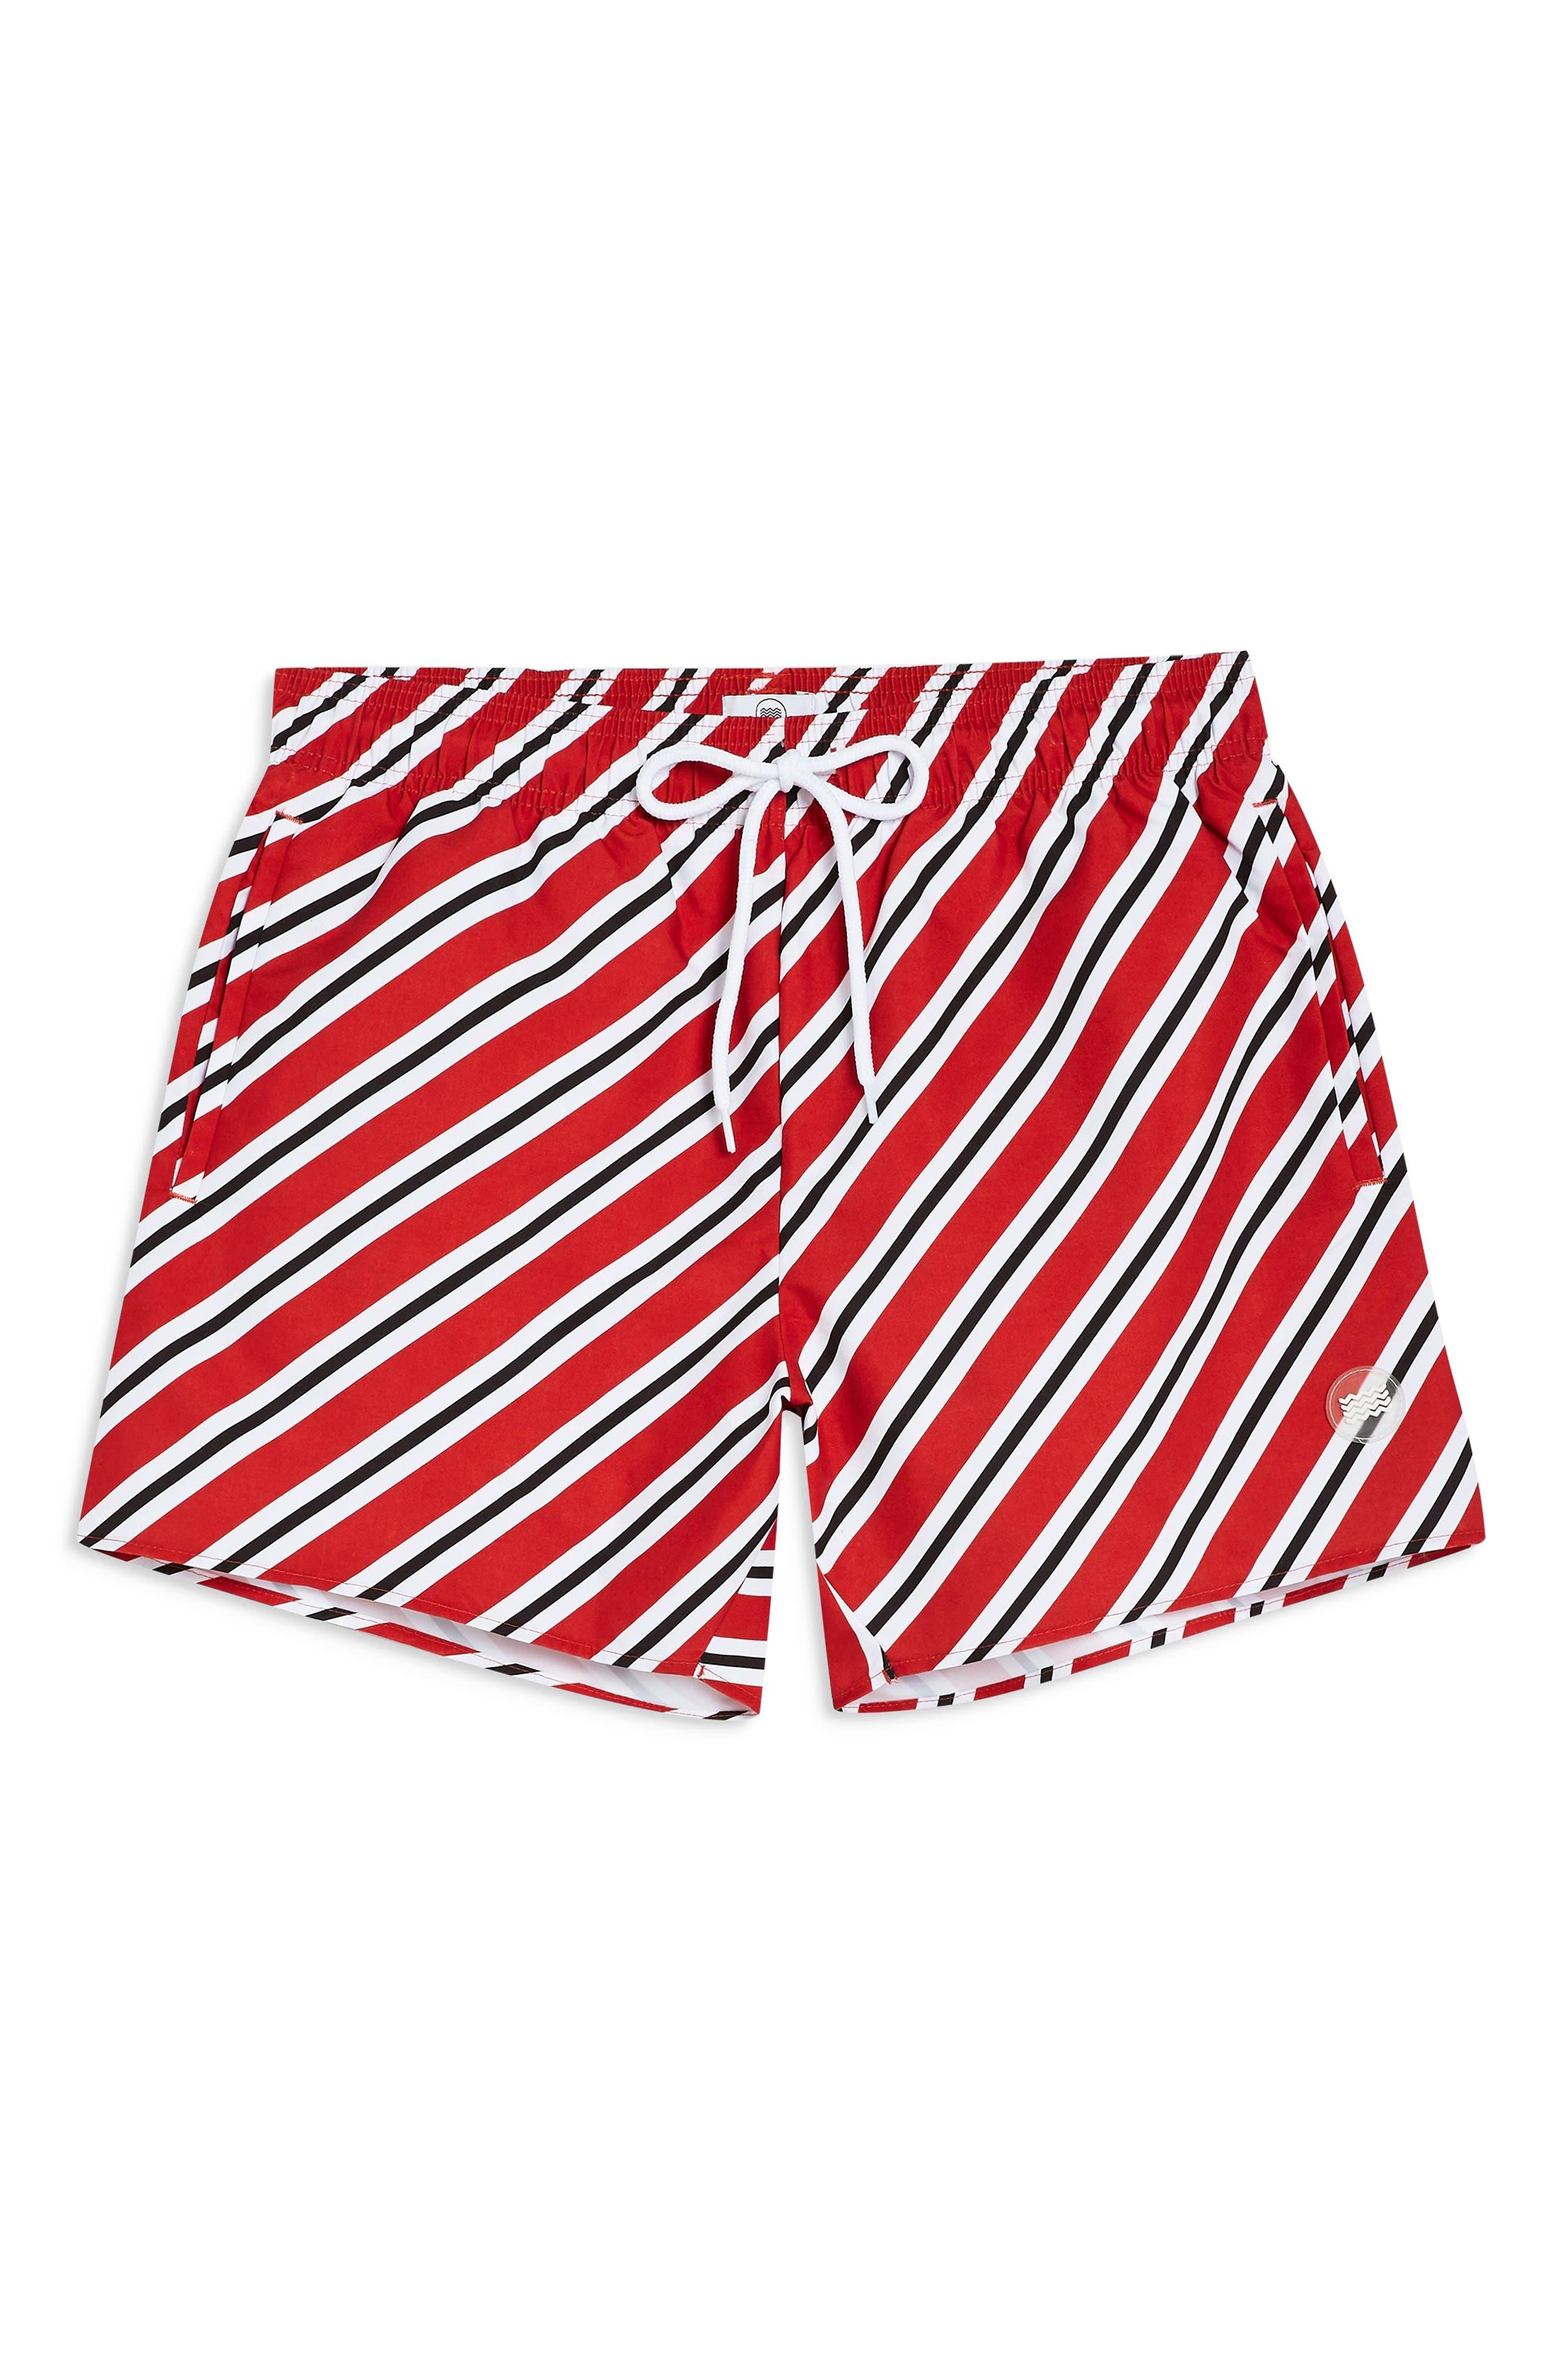 TOPMAN, Stripe Swim Trunks, Alternate thumbnail 4, color, RED MULTI